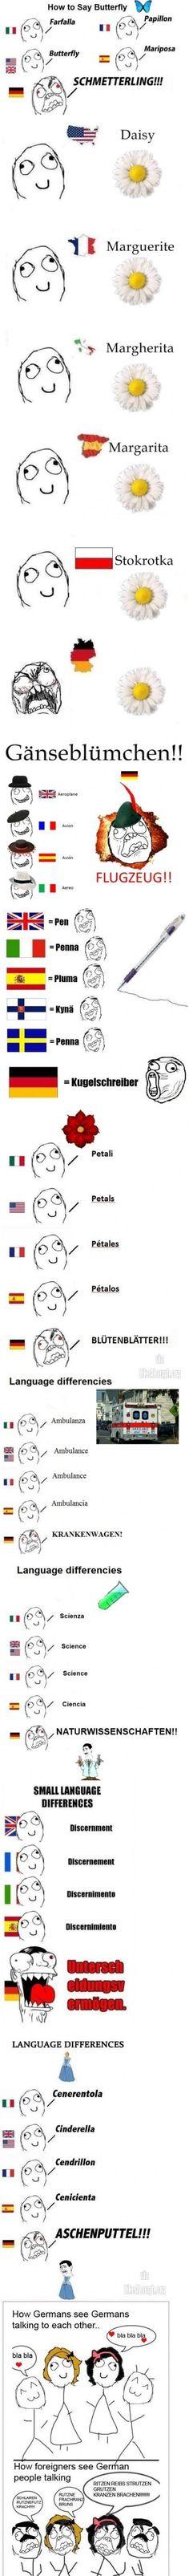 THE LOVELY GERMAN LANGUAGE